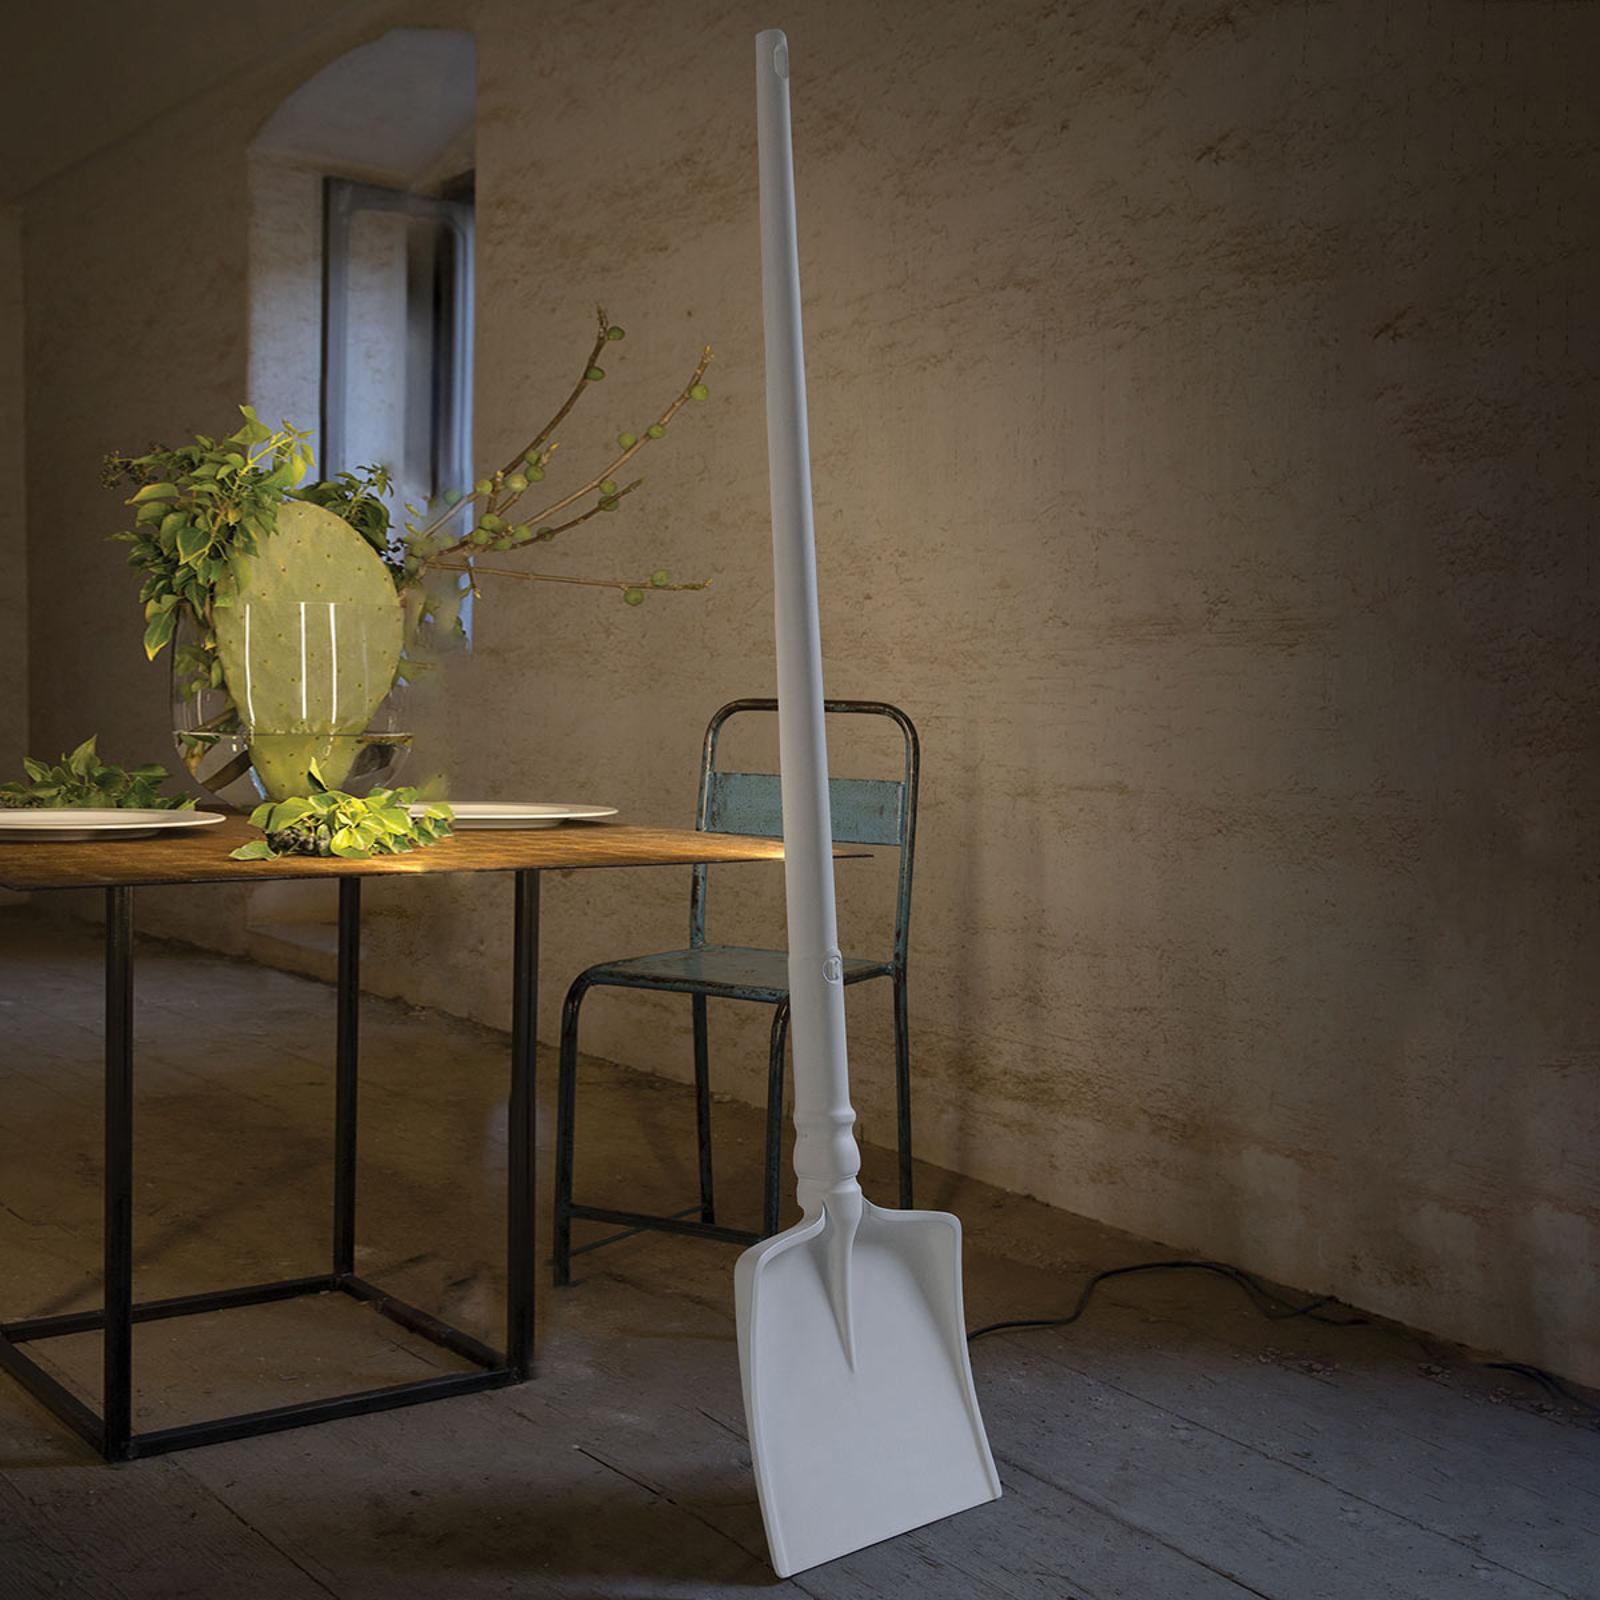 Designerska lampa stojąca LED Tobia, jak łopata